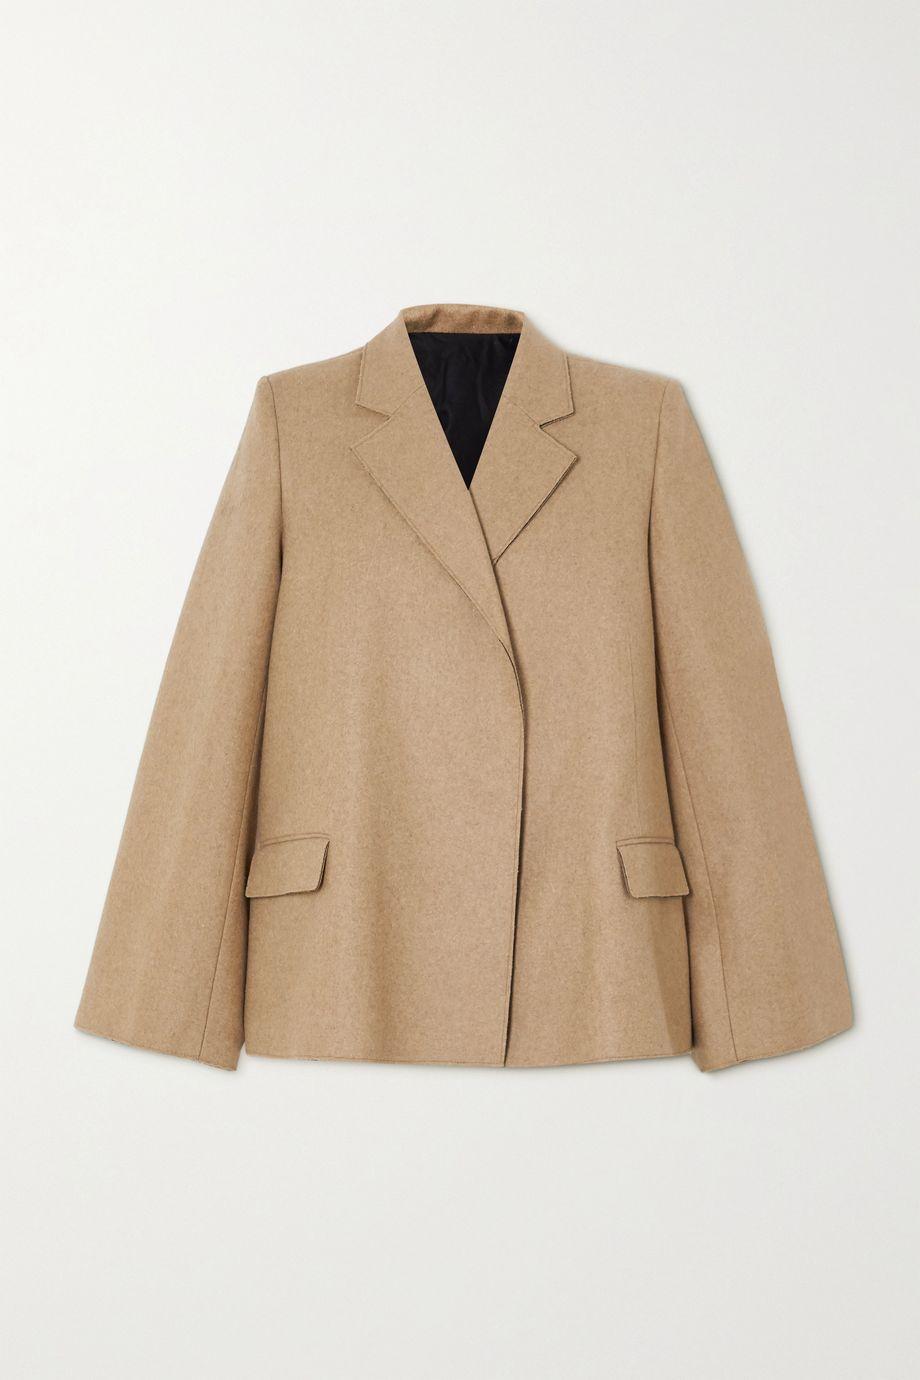 Totême Bonce wool-blend blazer